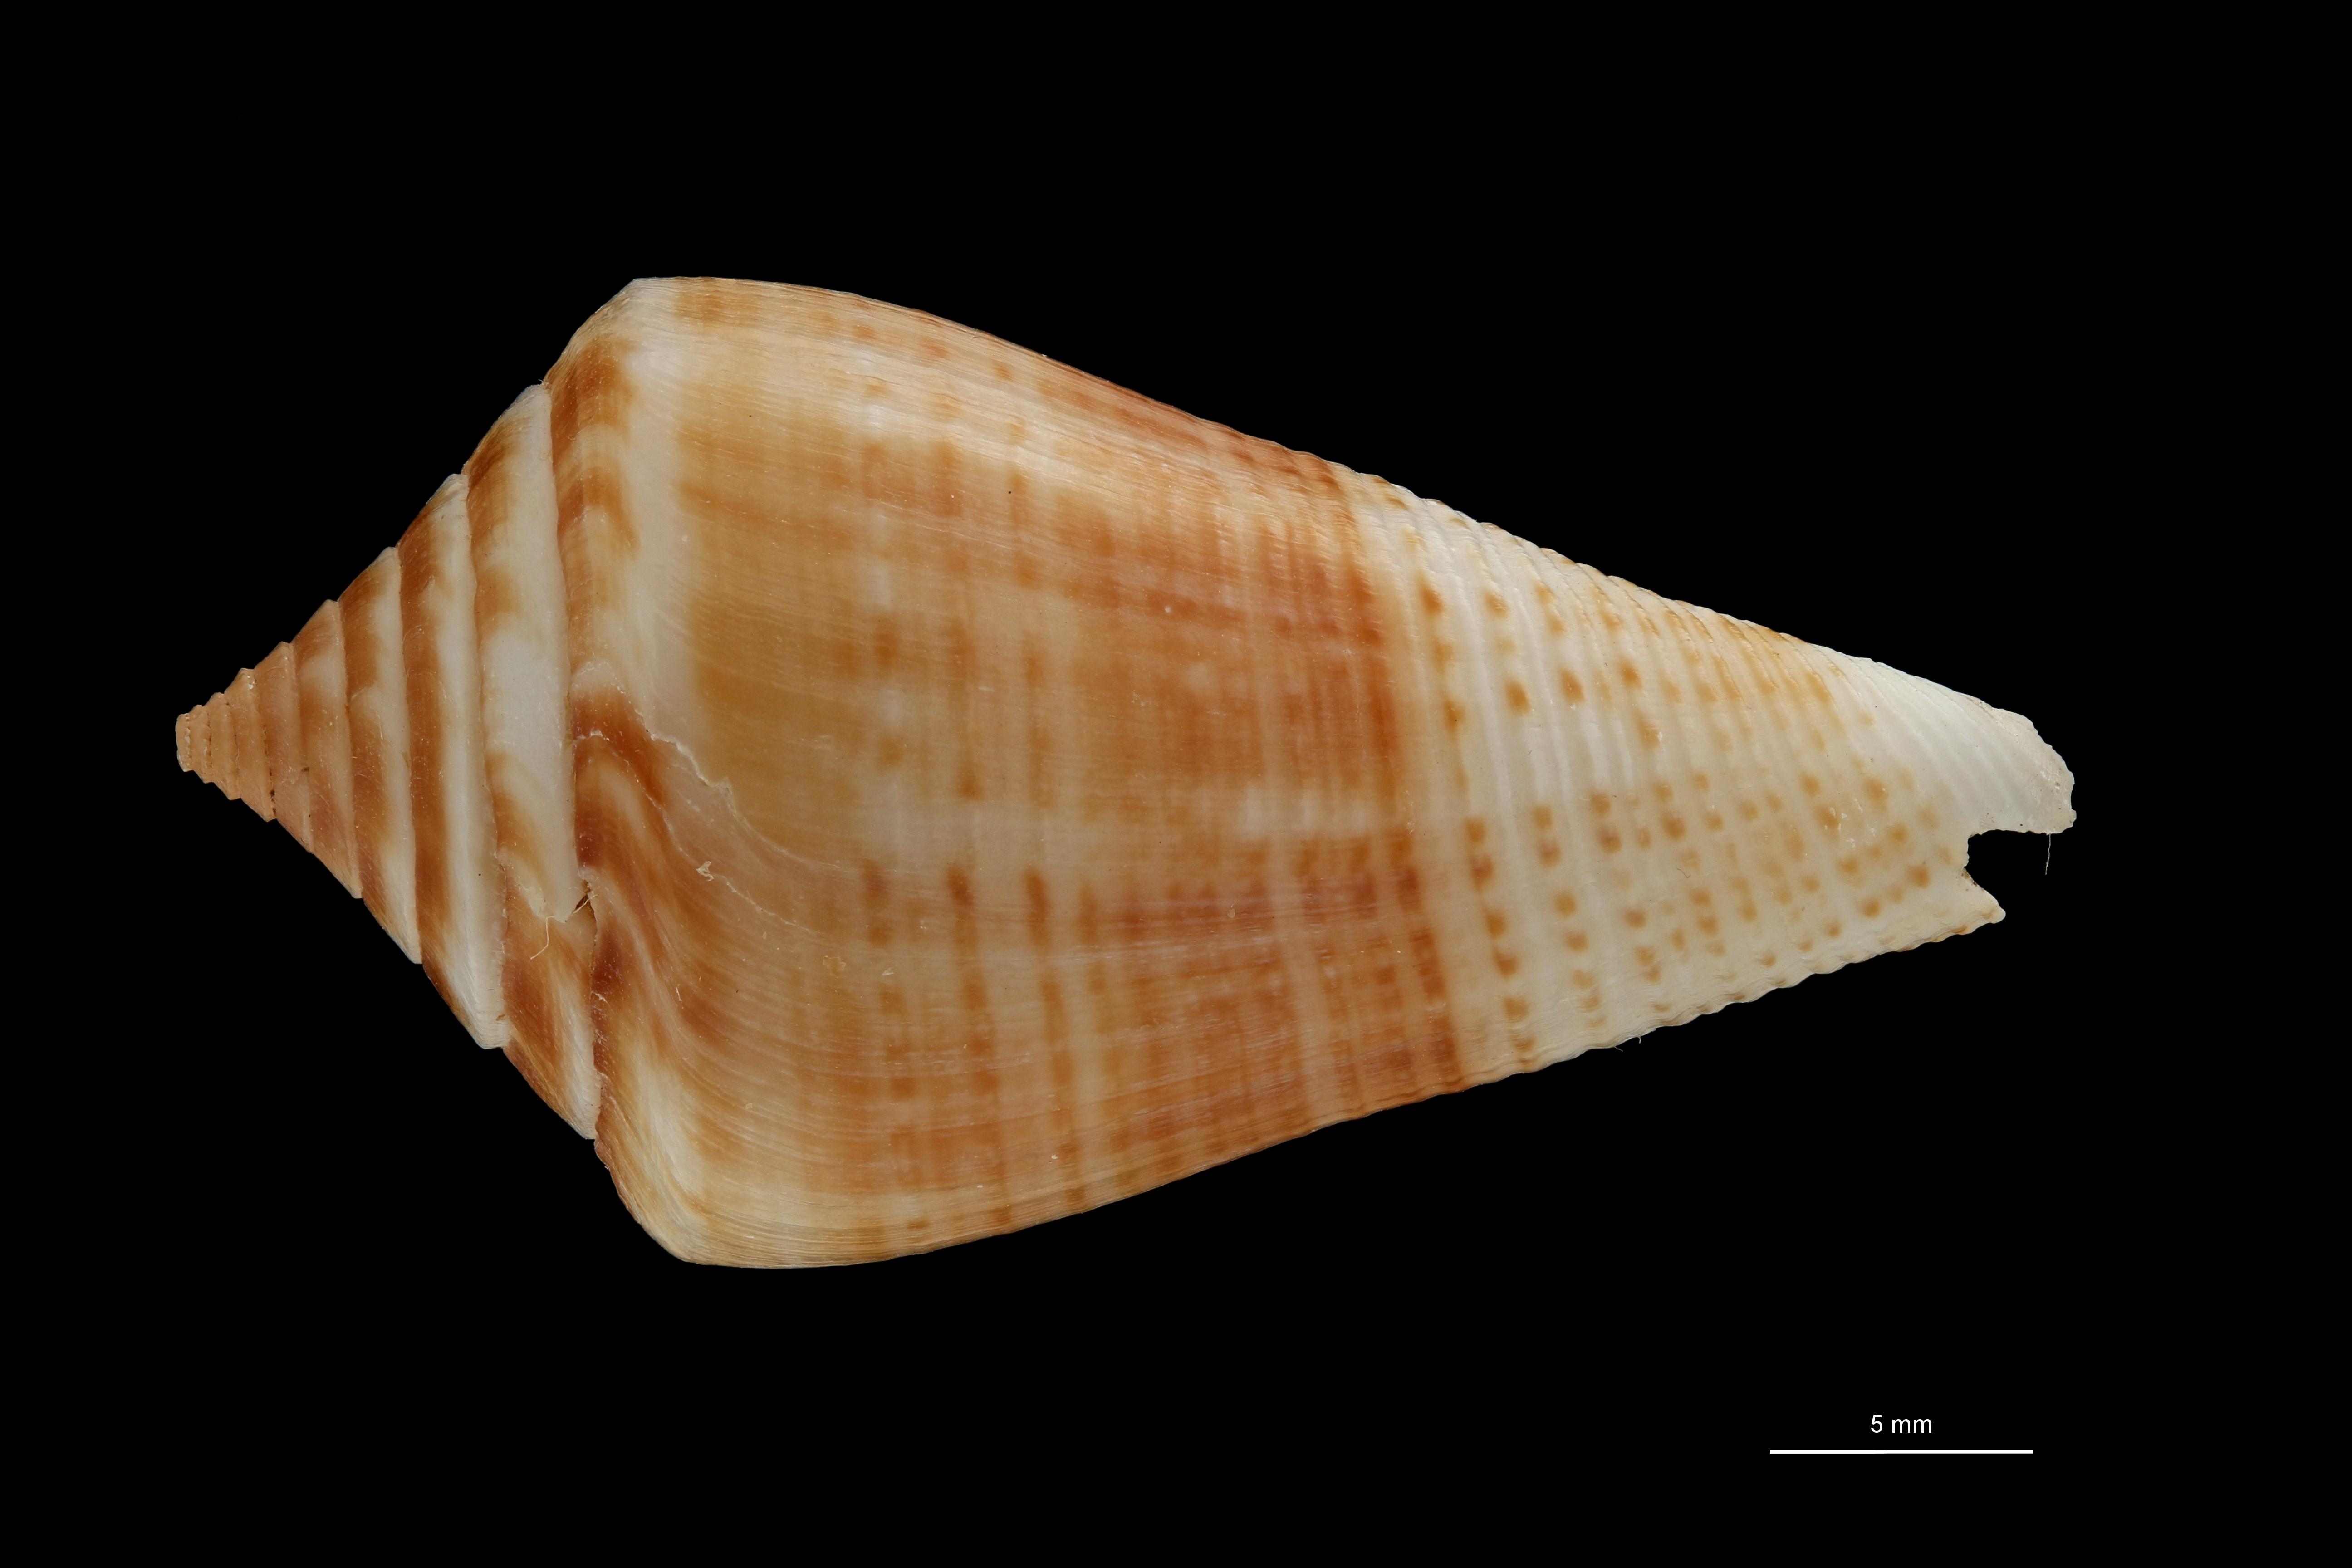 BE-RBINS-INV PARATYPE MT 3050 Conus (Dauciconus) bayeri DORSAL ZS PMax Scaled.jpg